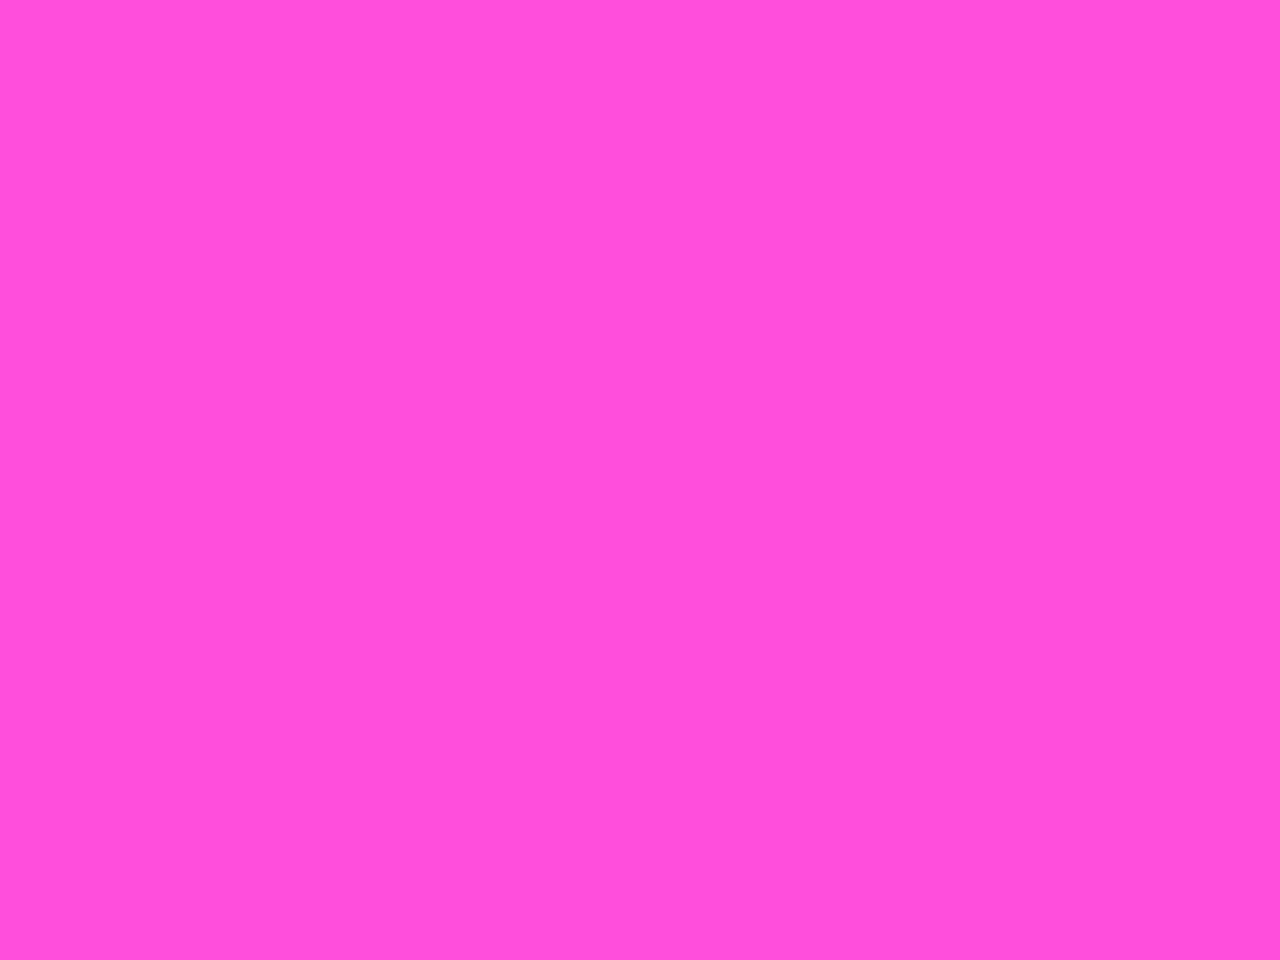 1280x960 Purple Pizzazz Solid Color Background